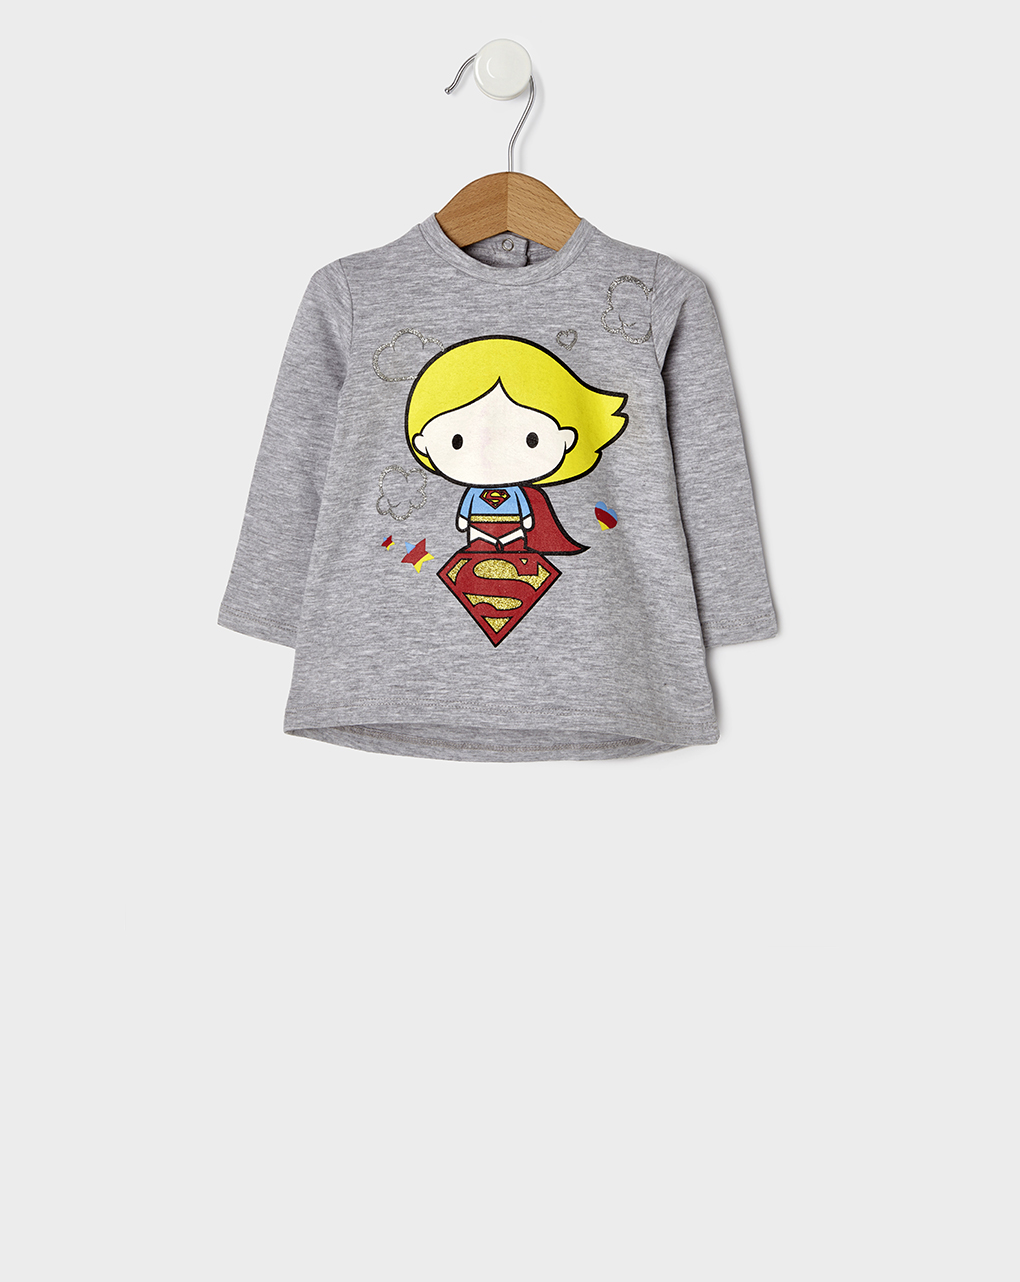 T-shirt Γκρι με Στάμπα Βaby Supergirl για Κορίτσι